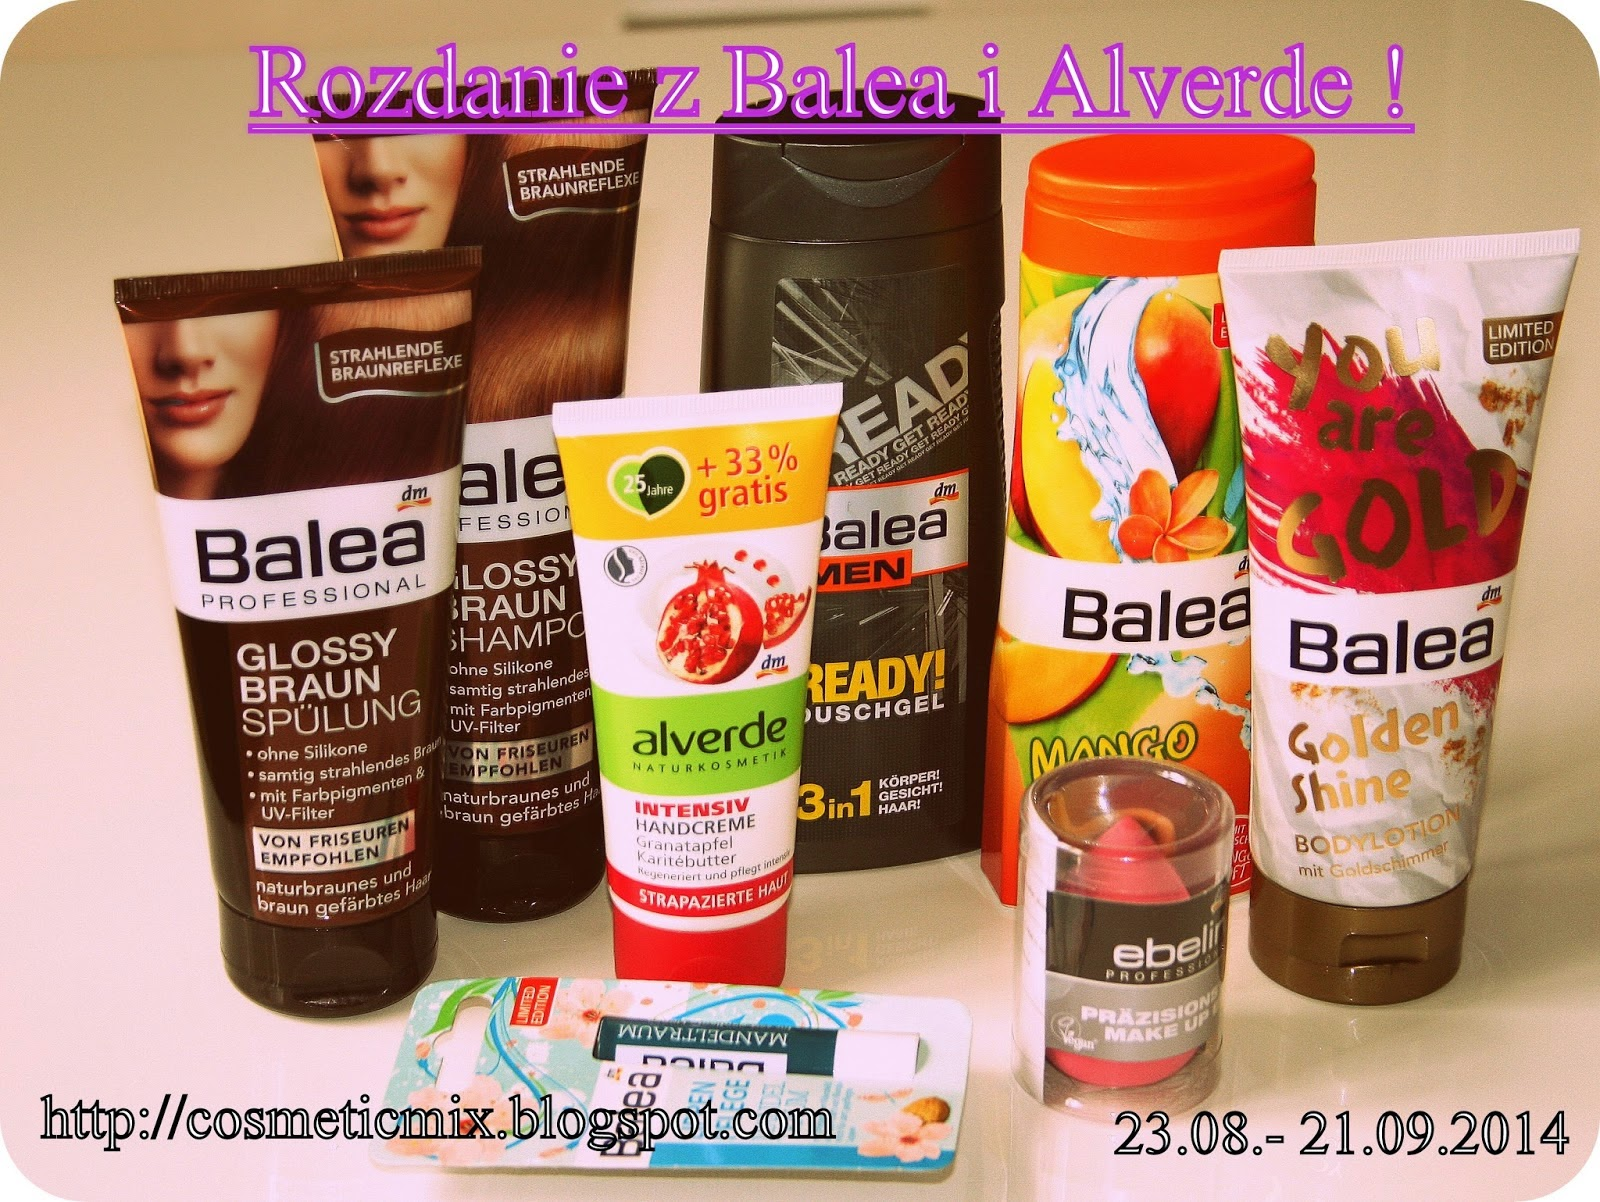 http://cosmeticmix.blogspot.com/2014/08/rozdanie-z-balea-i-alverde.html